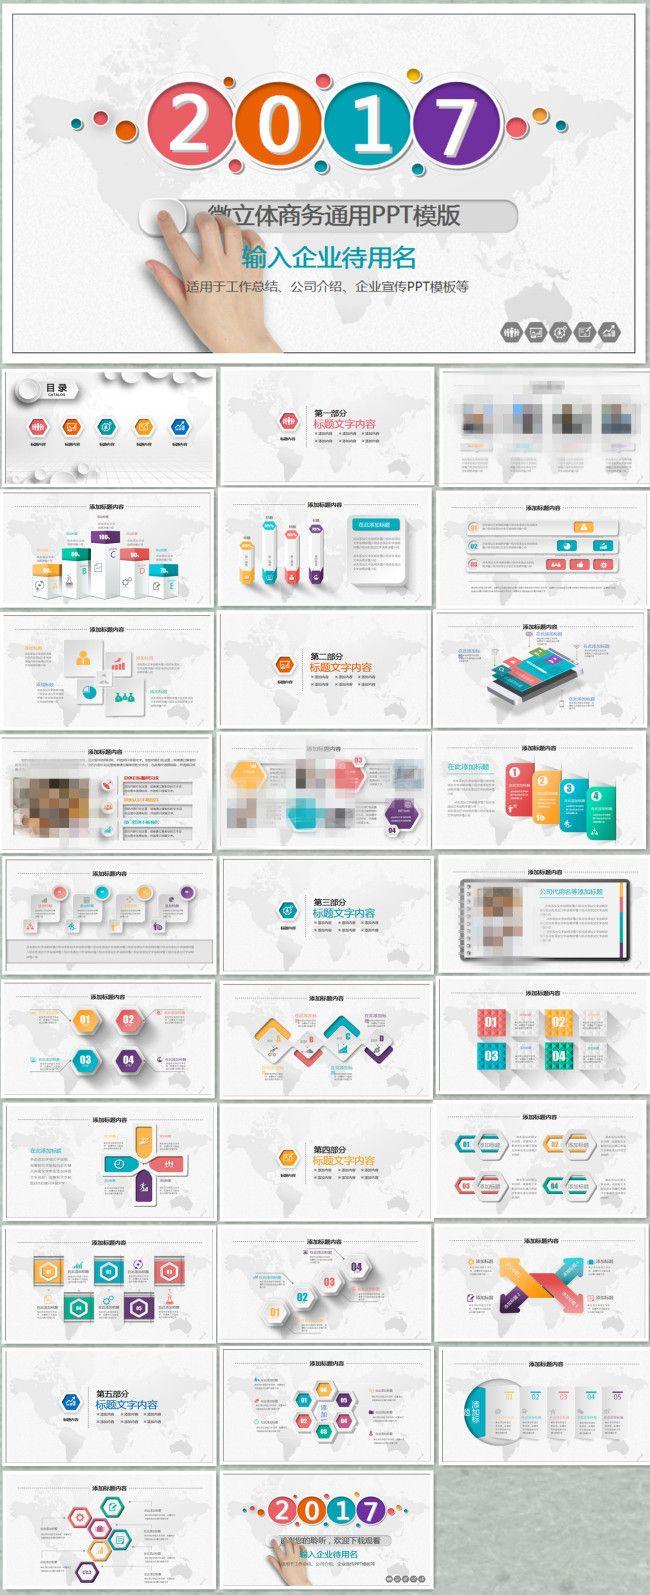 Fine general work summary report ppt template presentations fine general work summary report ppt template maxwellsz